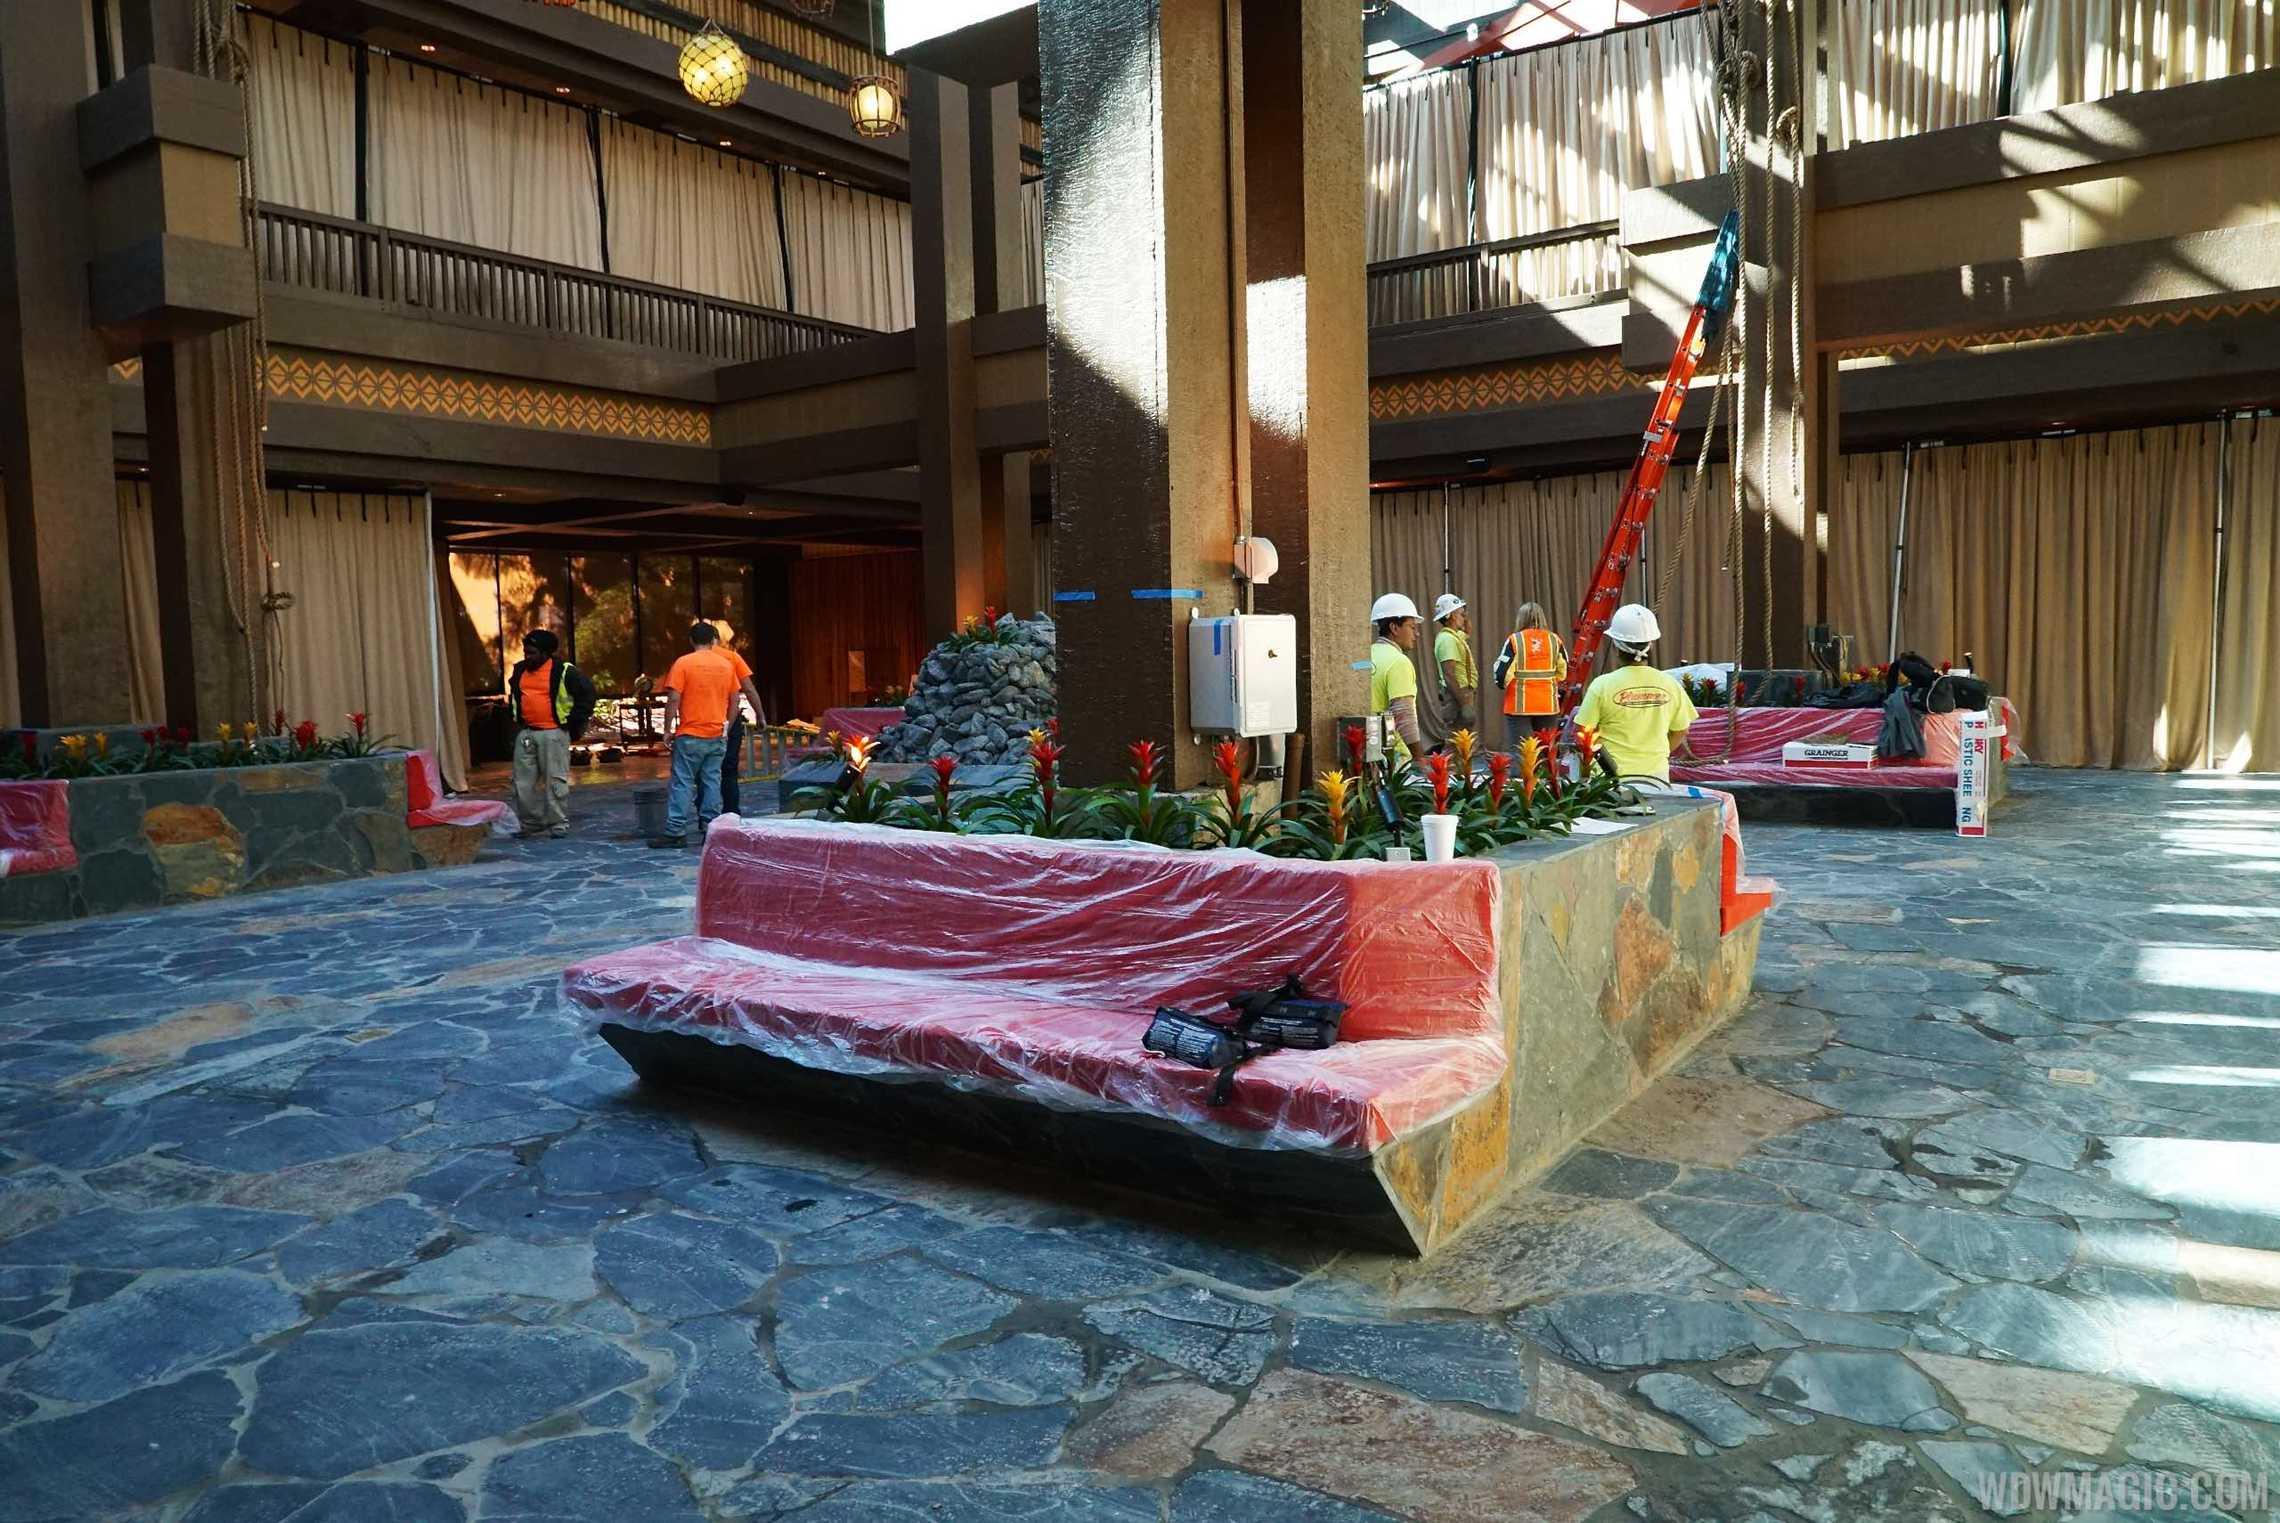 New Polynesian Lobby from ground level